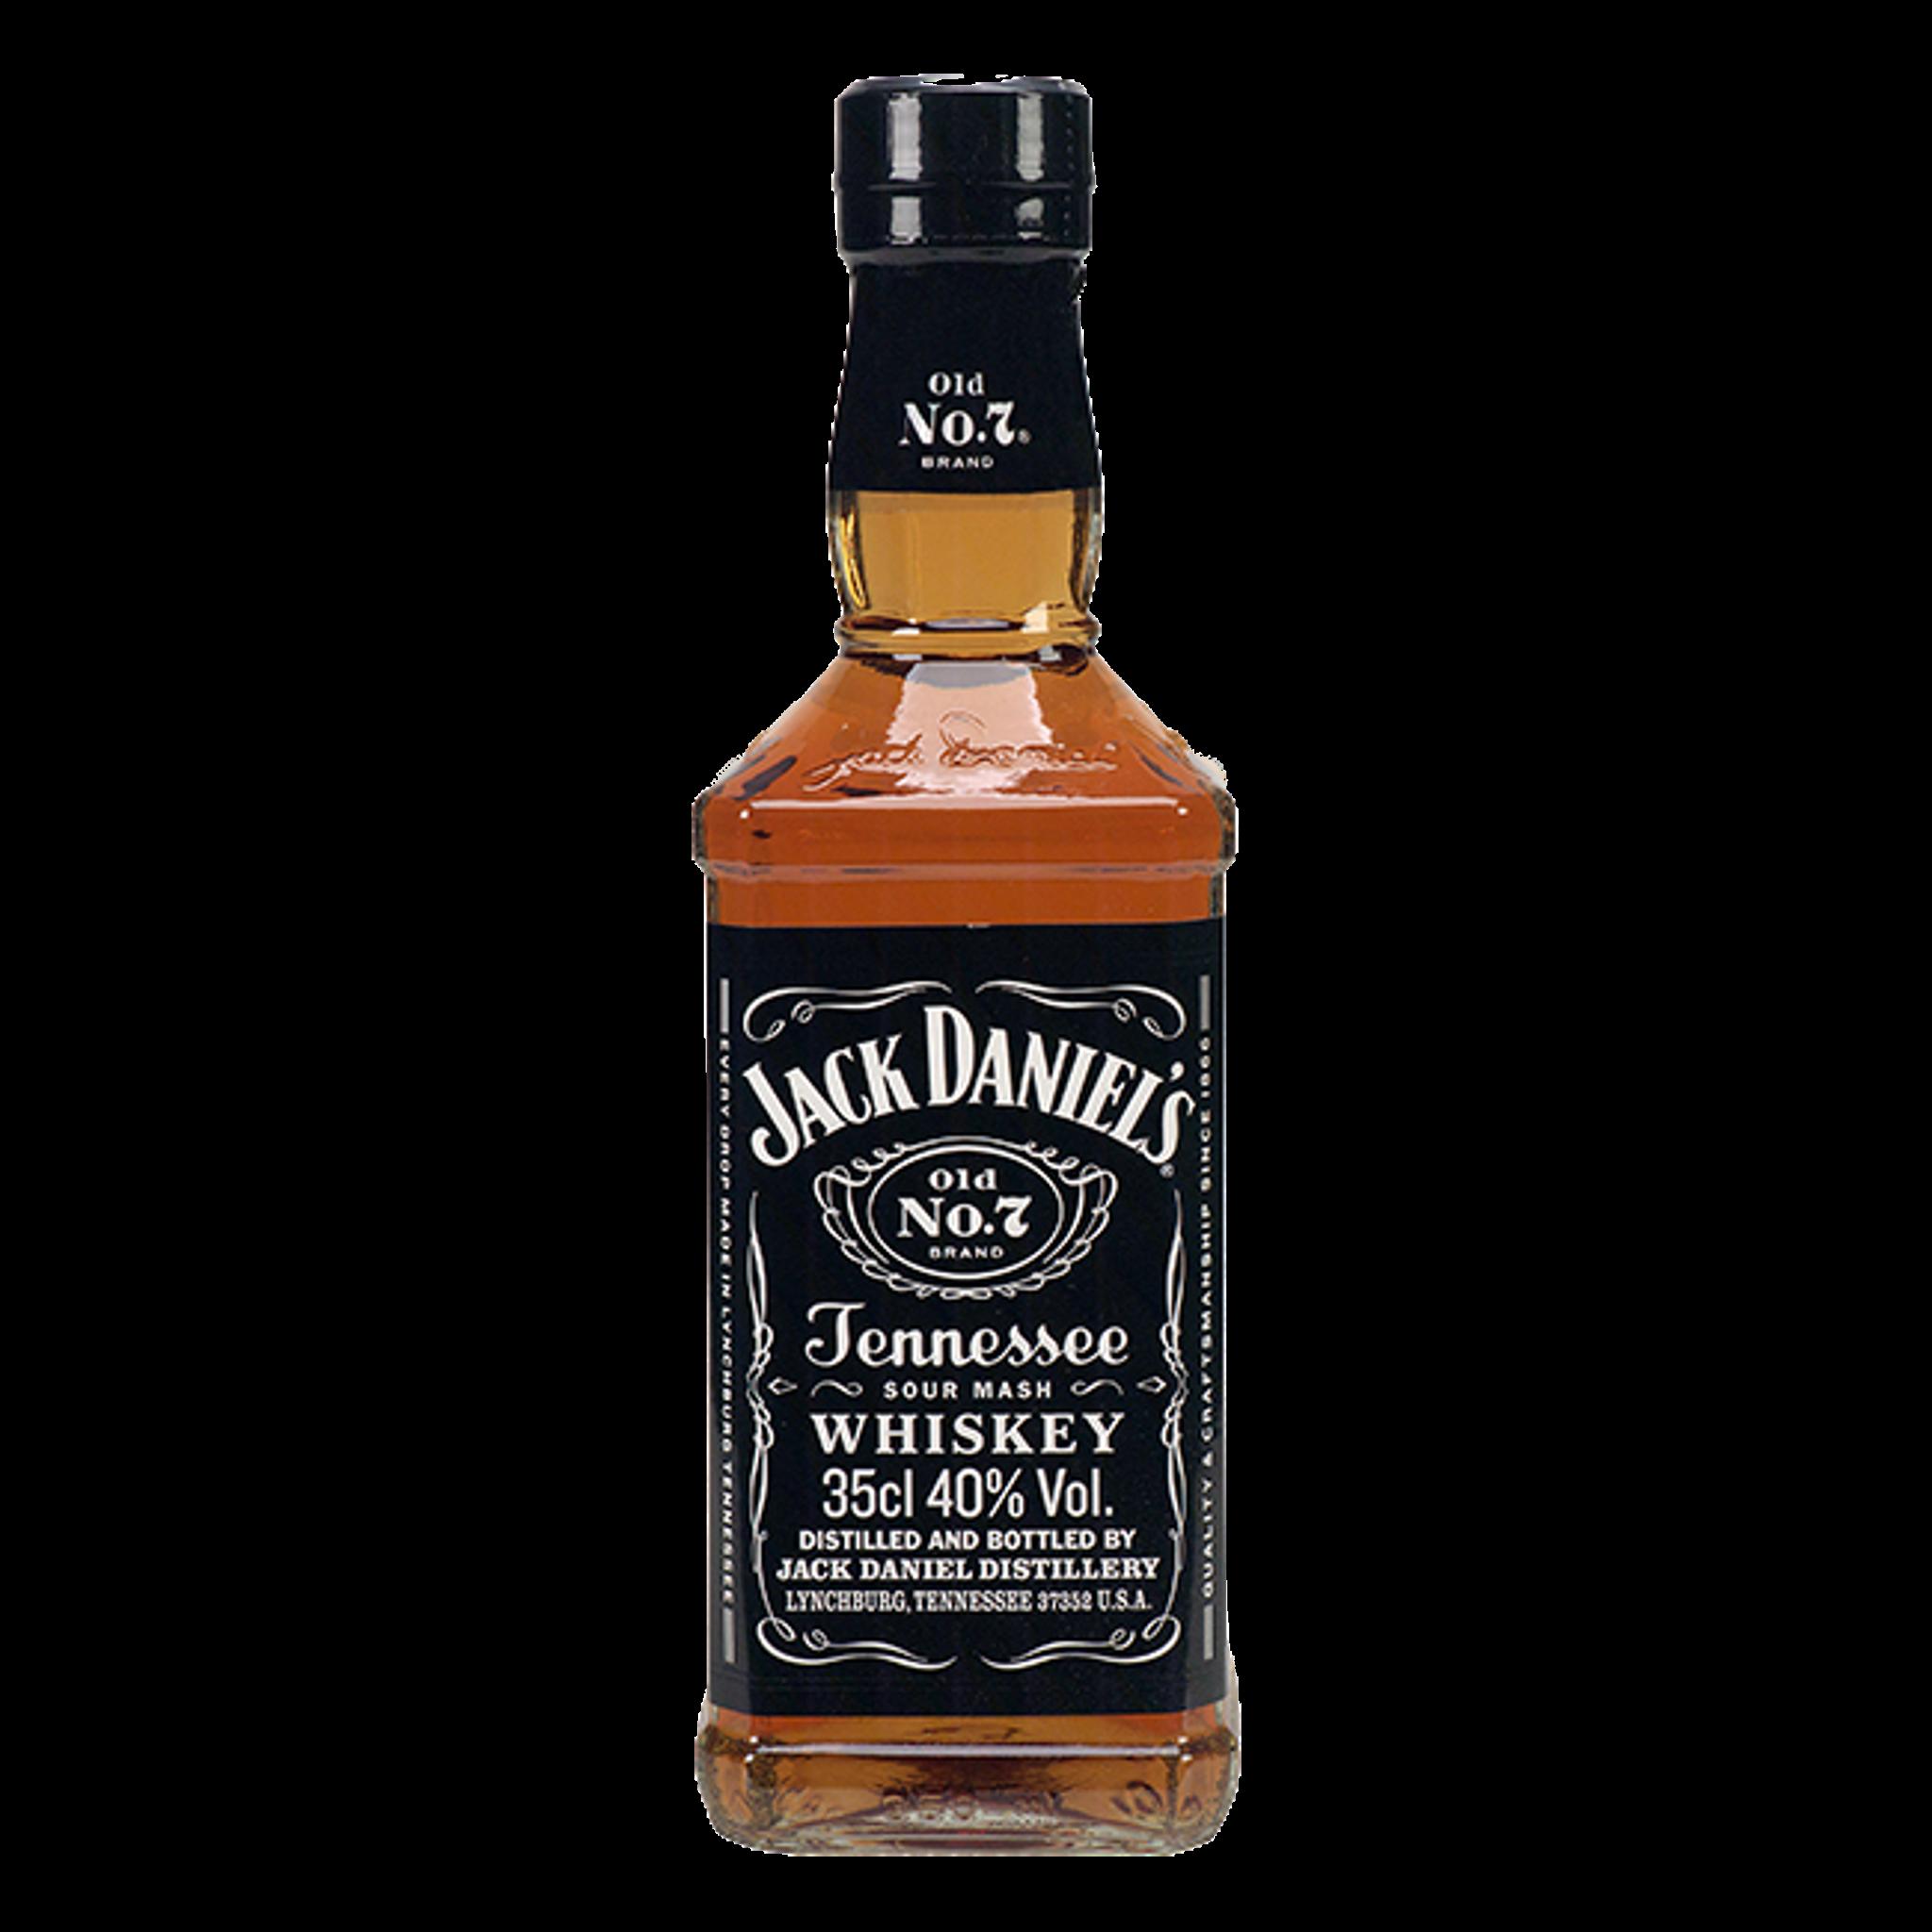 Jack Daniels 350Ml - Brown-Forman Australia Pty Limited